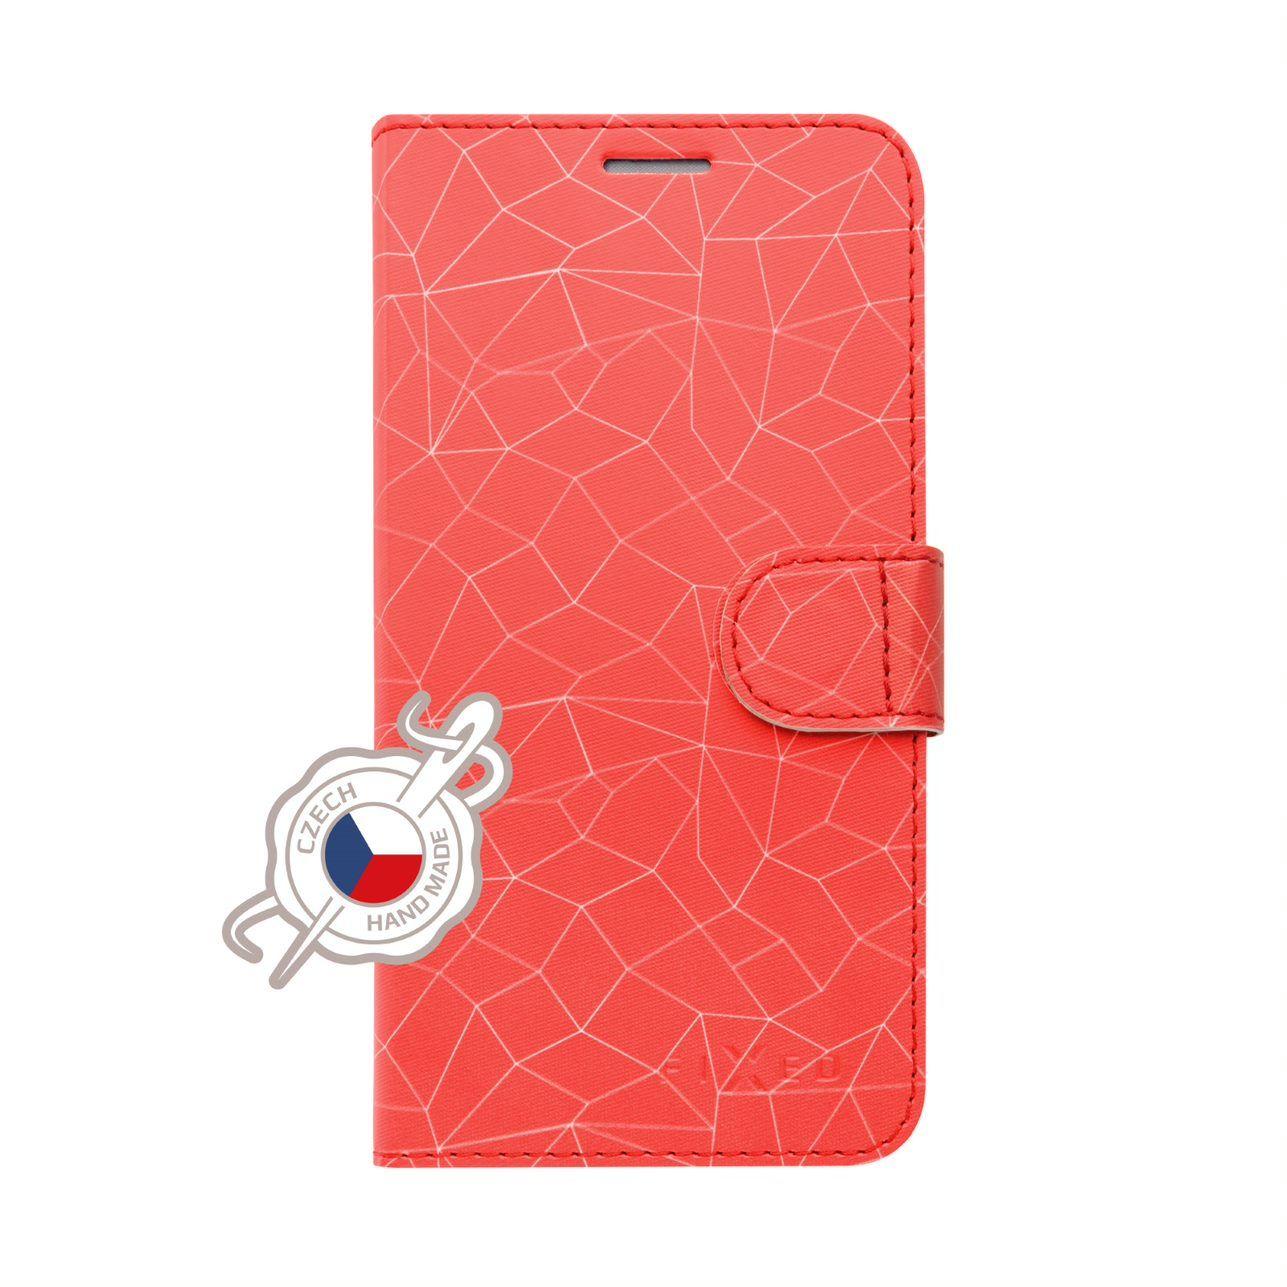 FIXED FIT flipové pouzdro pro Samsung Galaxy A50, motiv Red Mesh